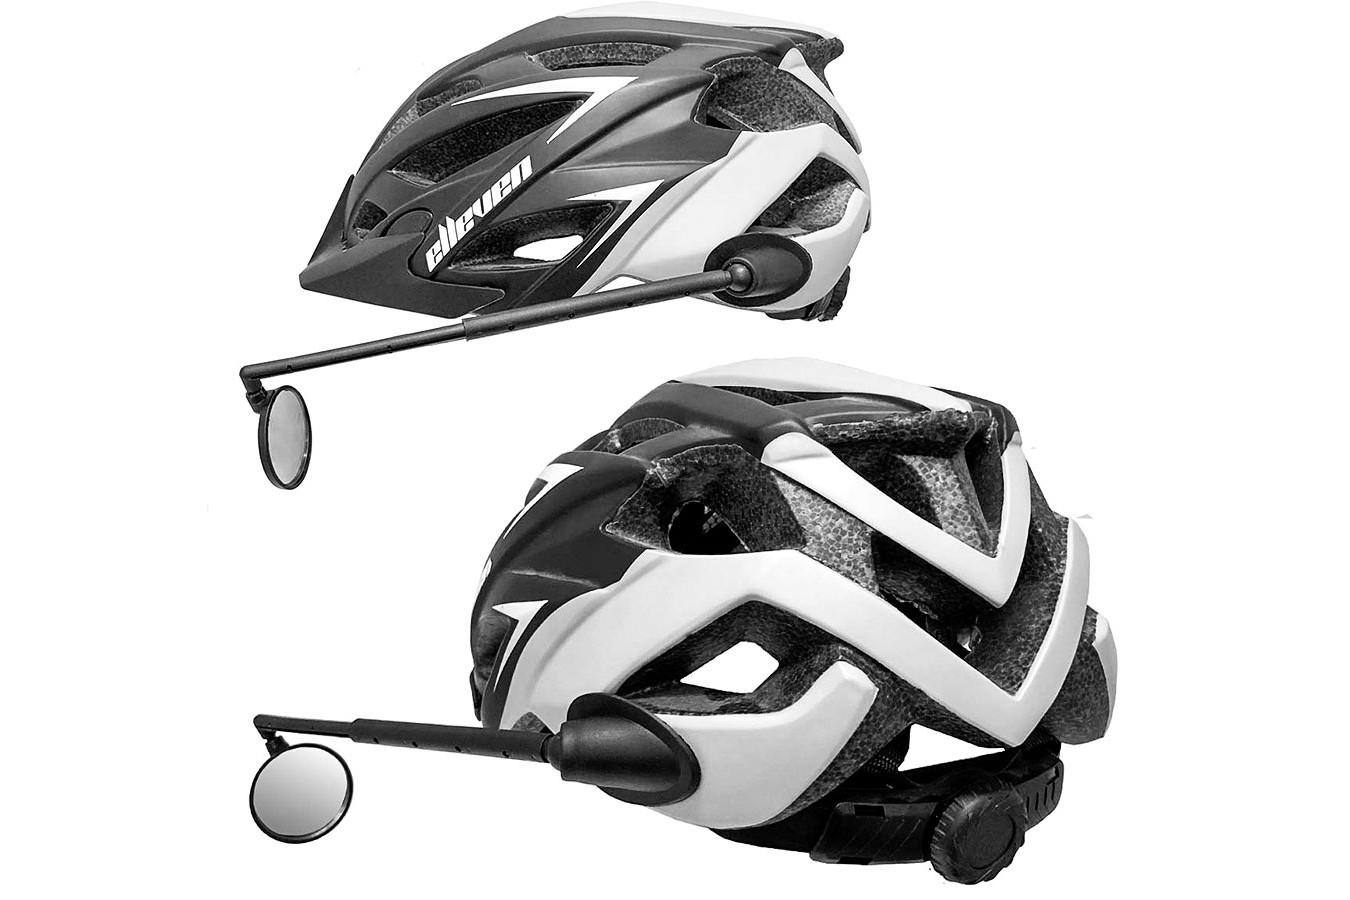 Espelho para Capacete de Ciclista Preto Elleven